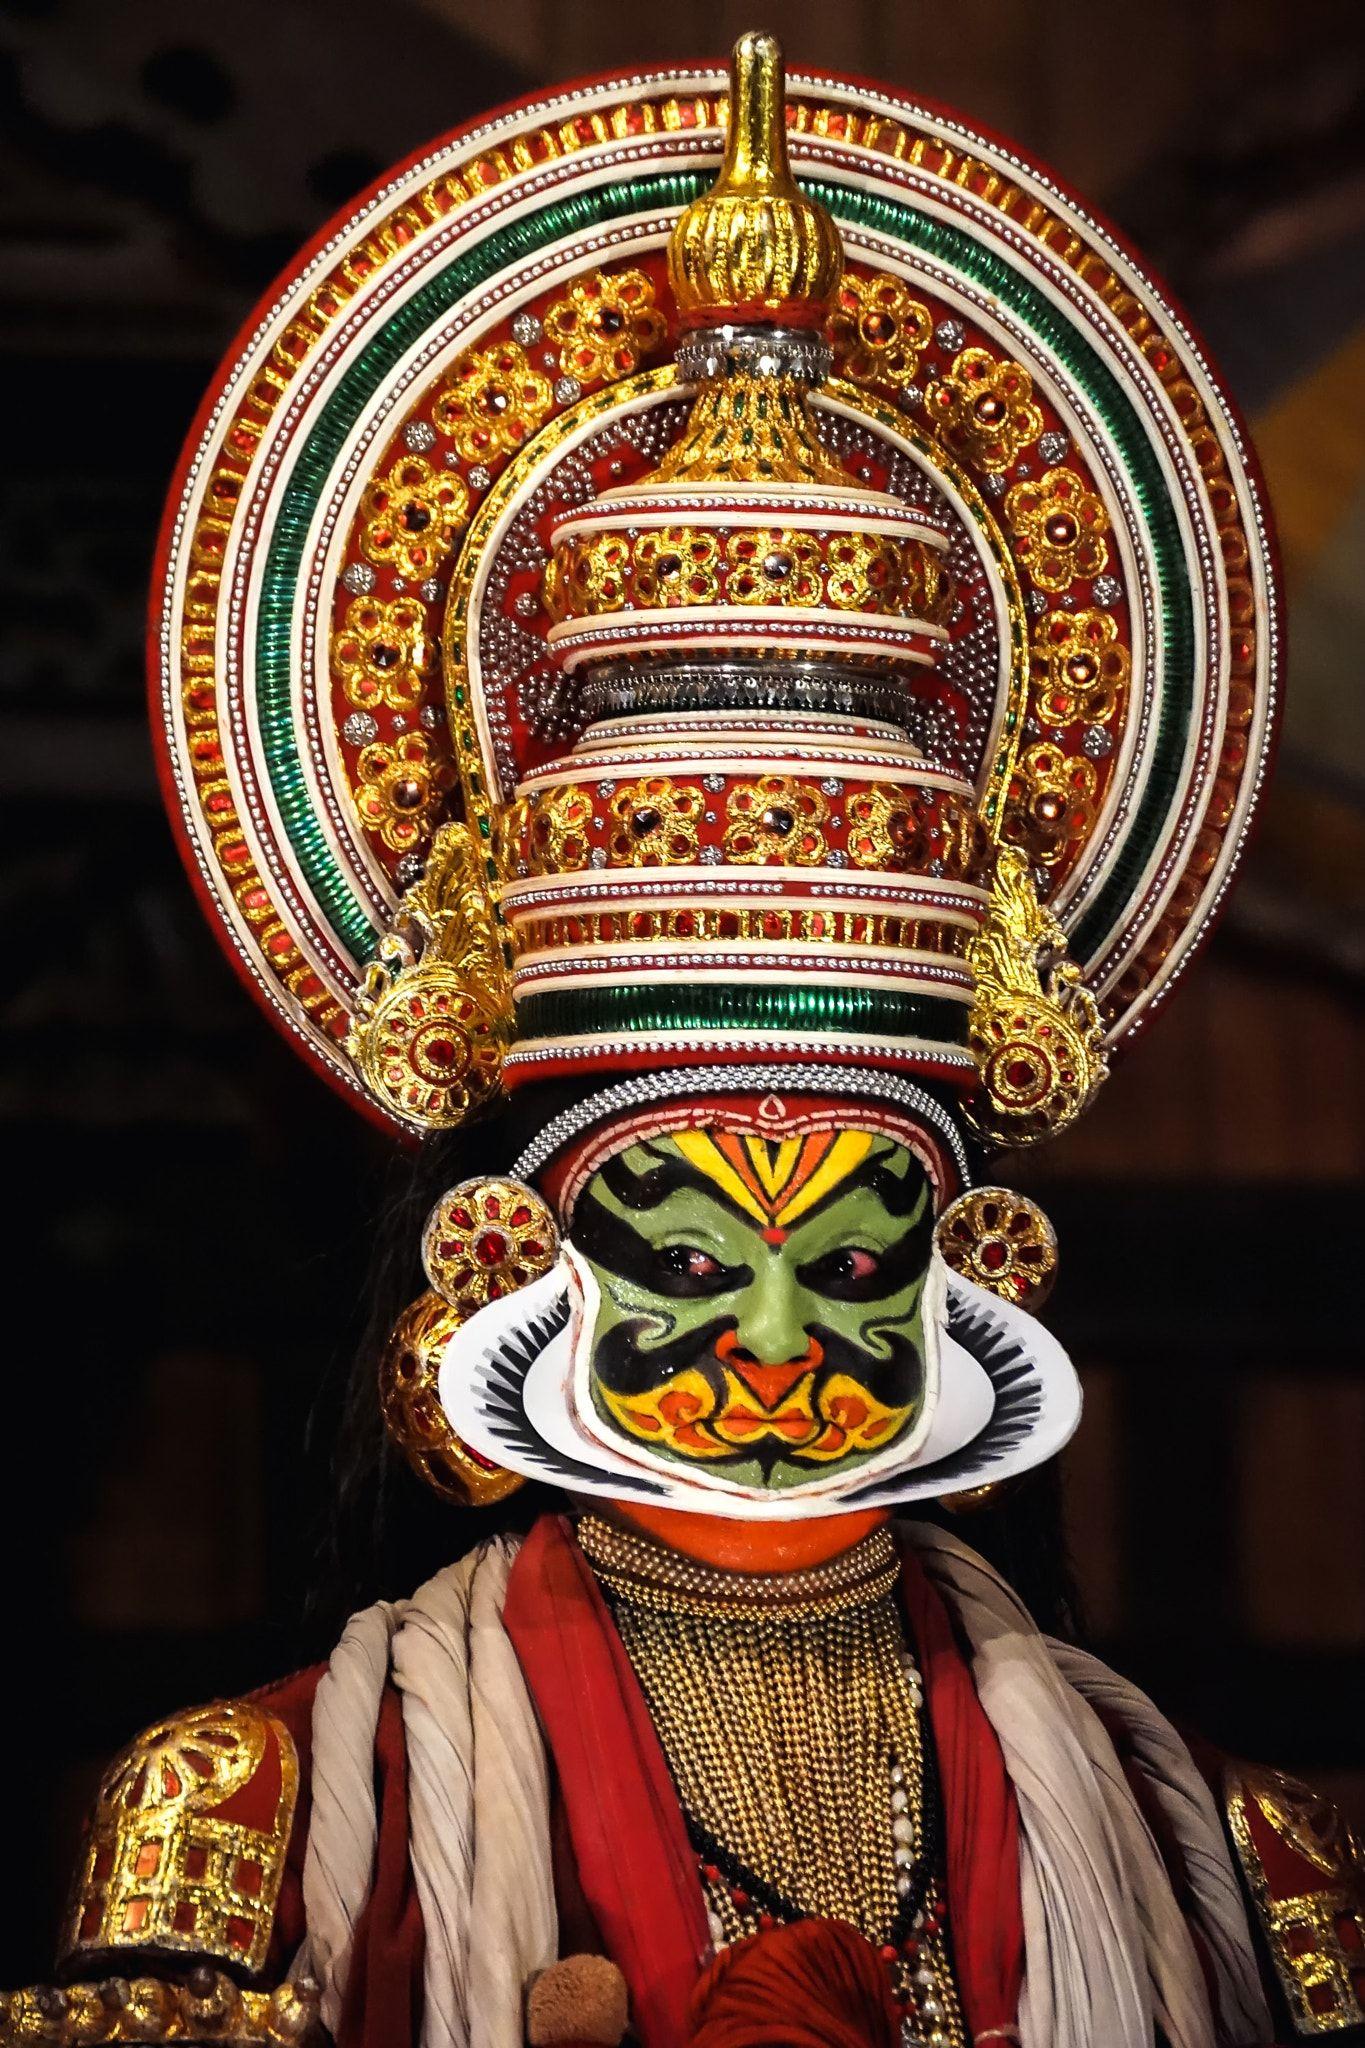 Kathakali perfomer - Portrait of the unidentified kathakali